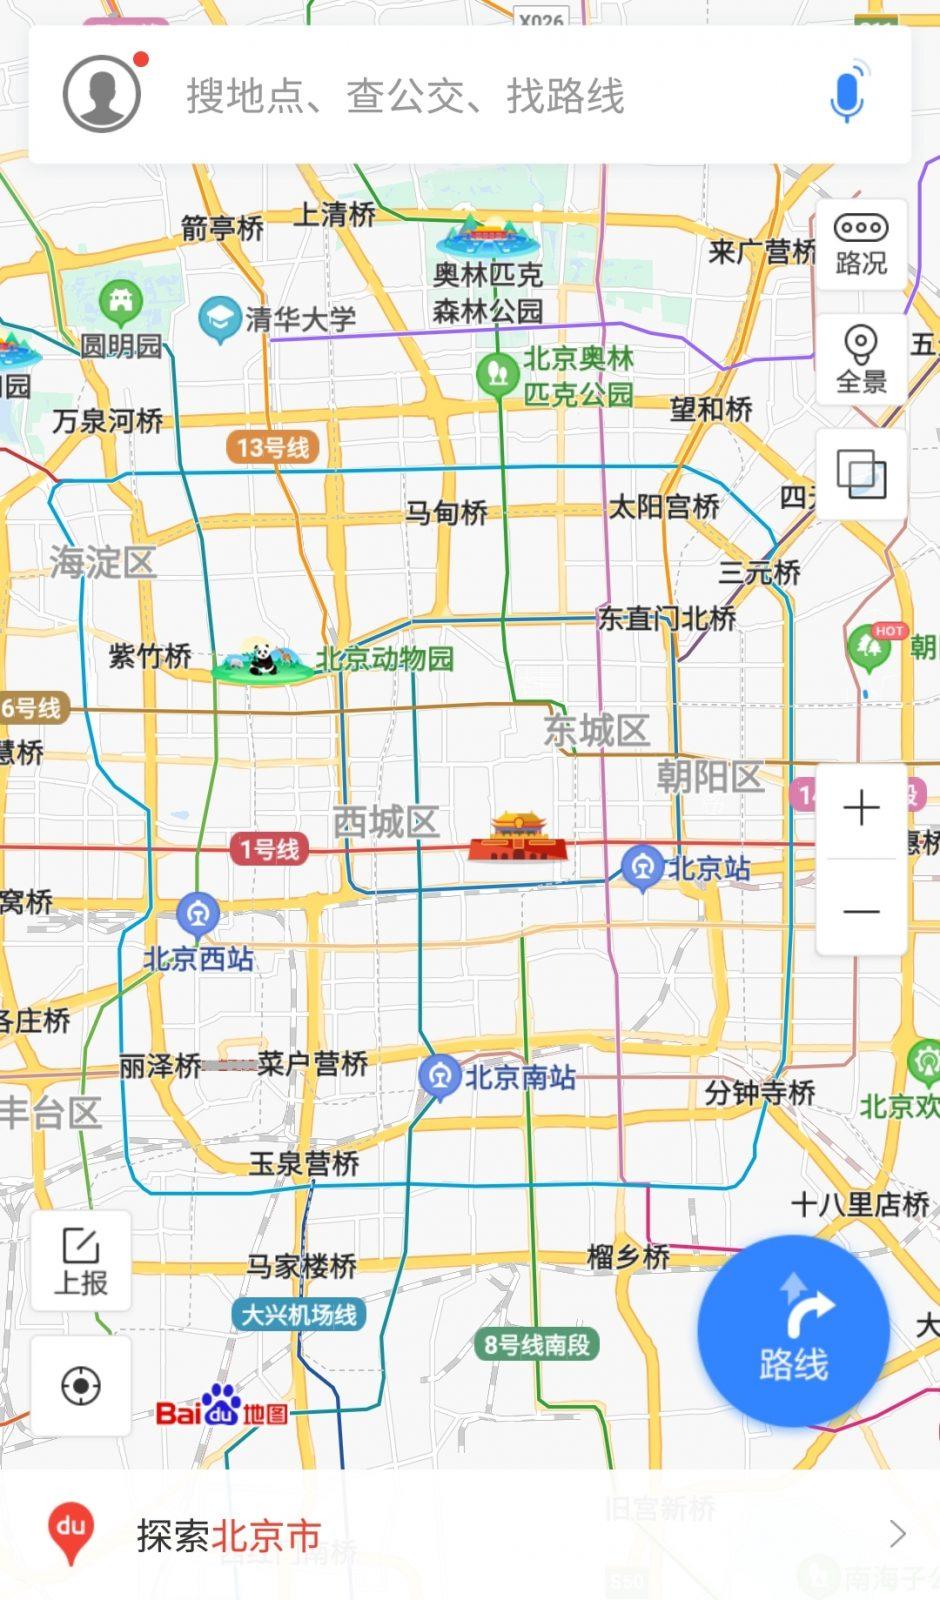 Baidu Maps android ios 按掉 苹果 百度地图